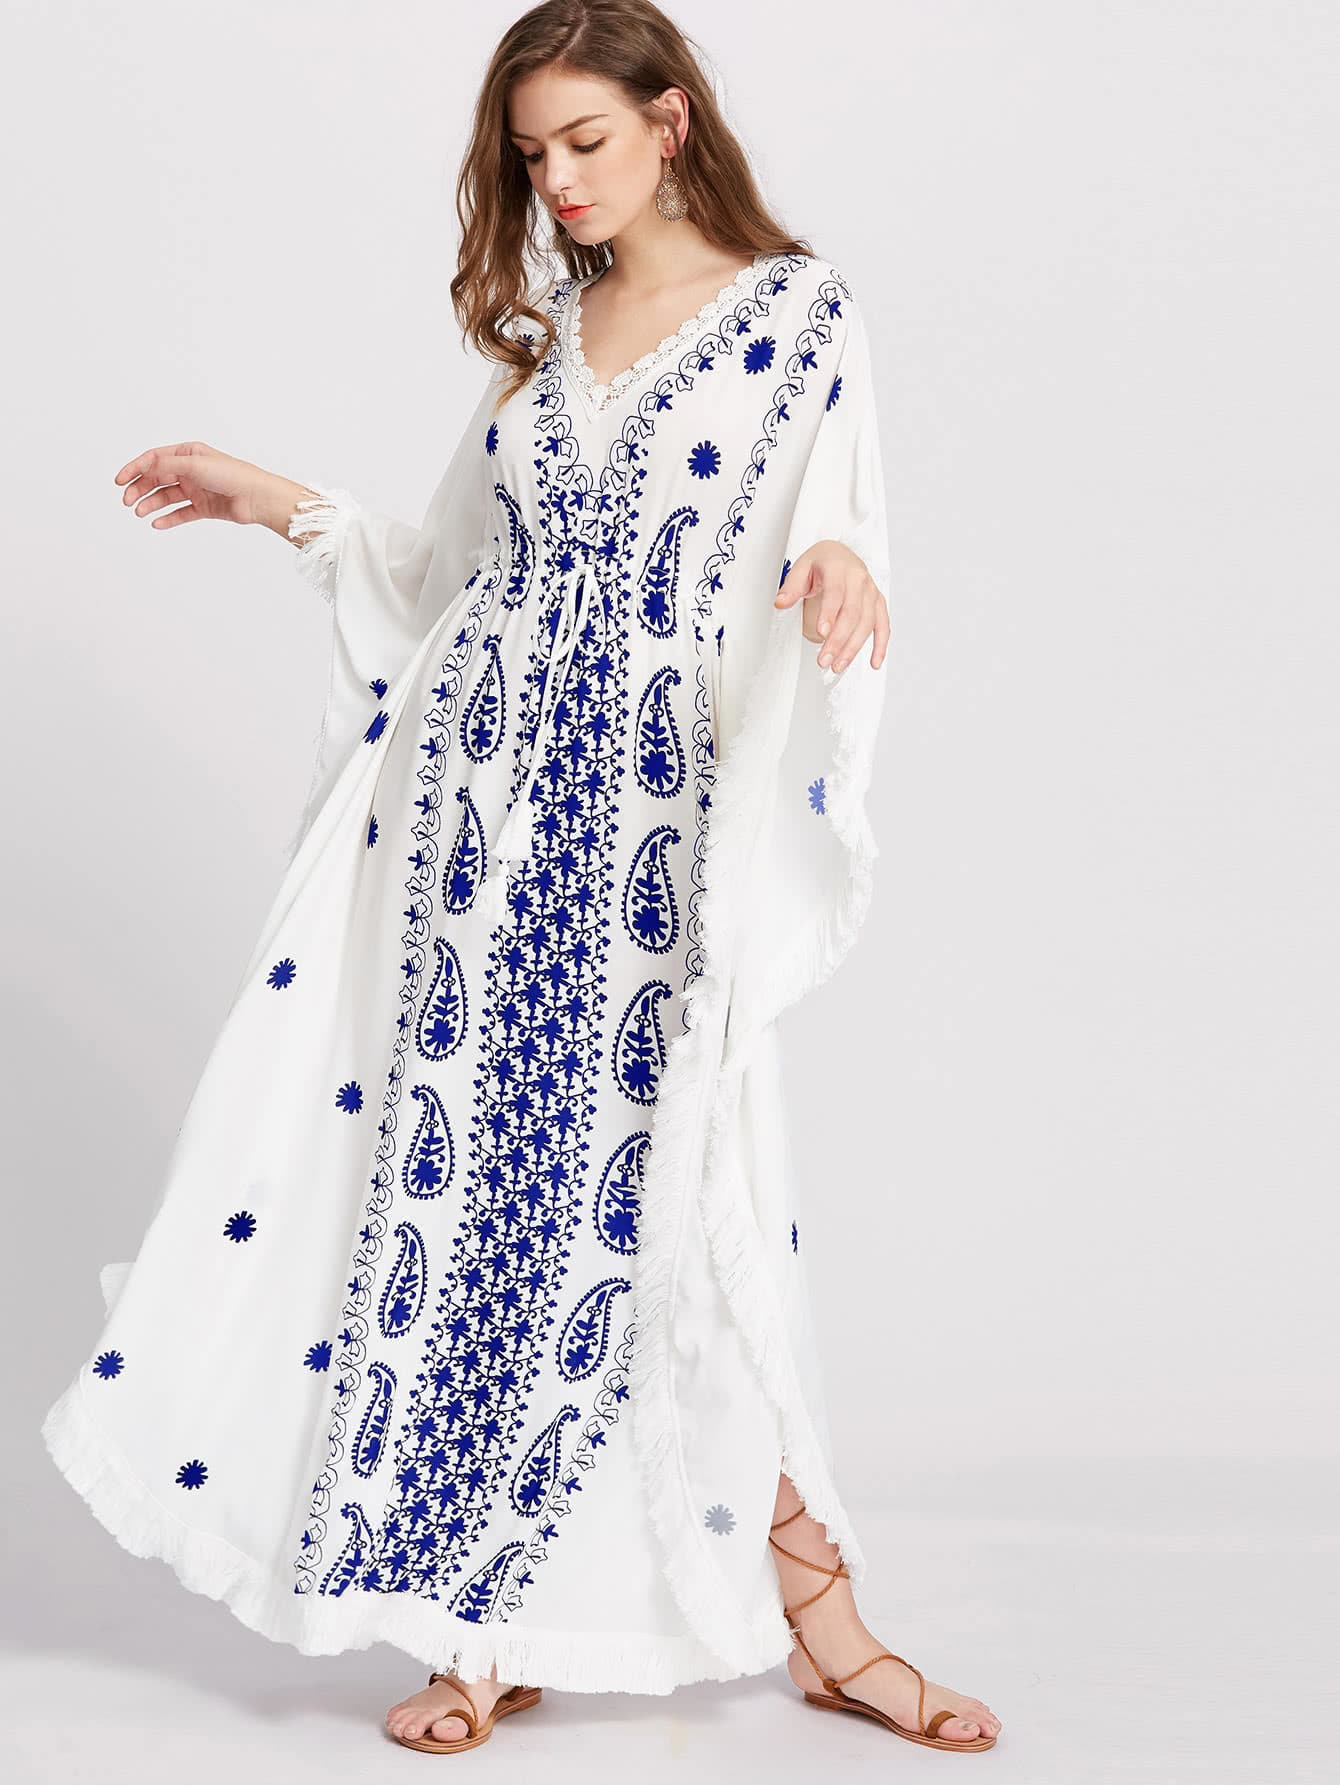 Fringe Trim Paisley Print Dolman Sleeve Dress paisley print fringe trim kimono